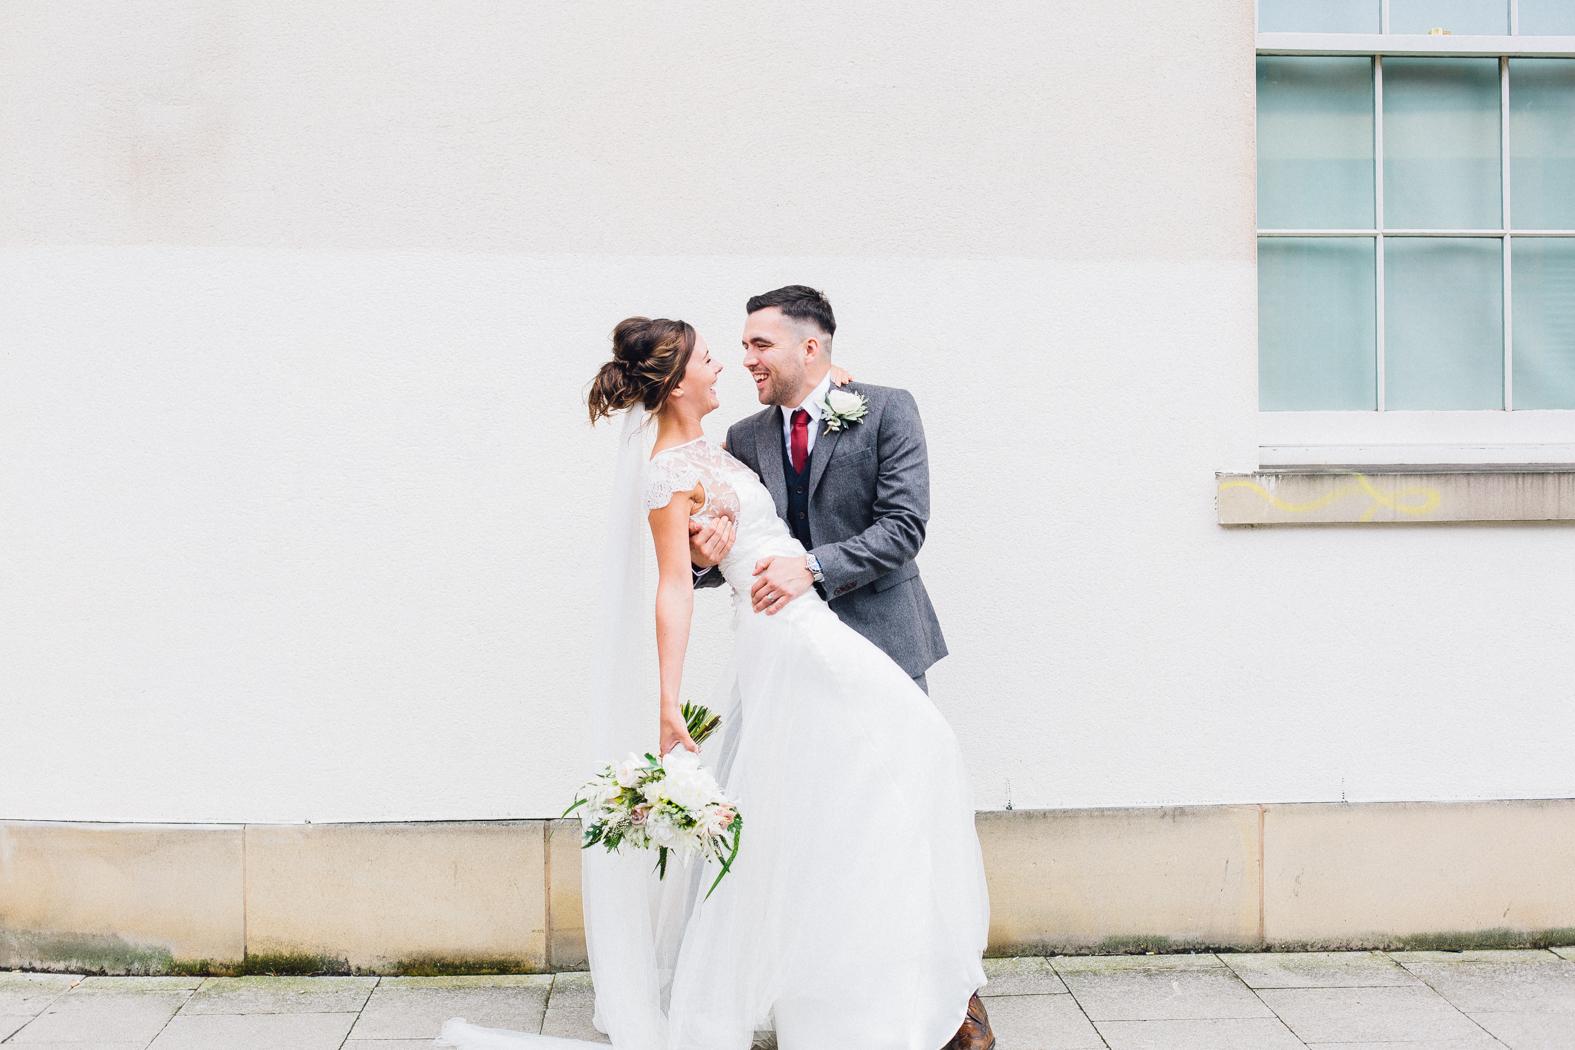 Halfpenny london wedding dress for an industrial wedding in sheffield bride groom ombrellifo Choice Image